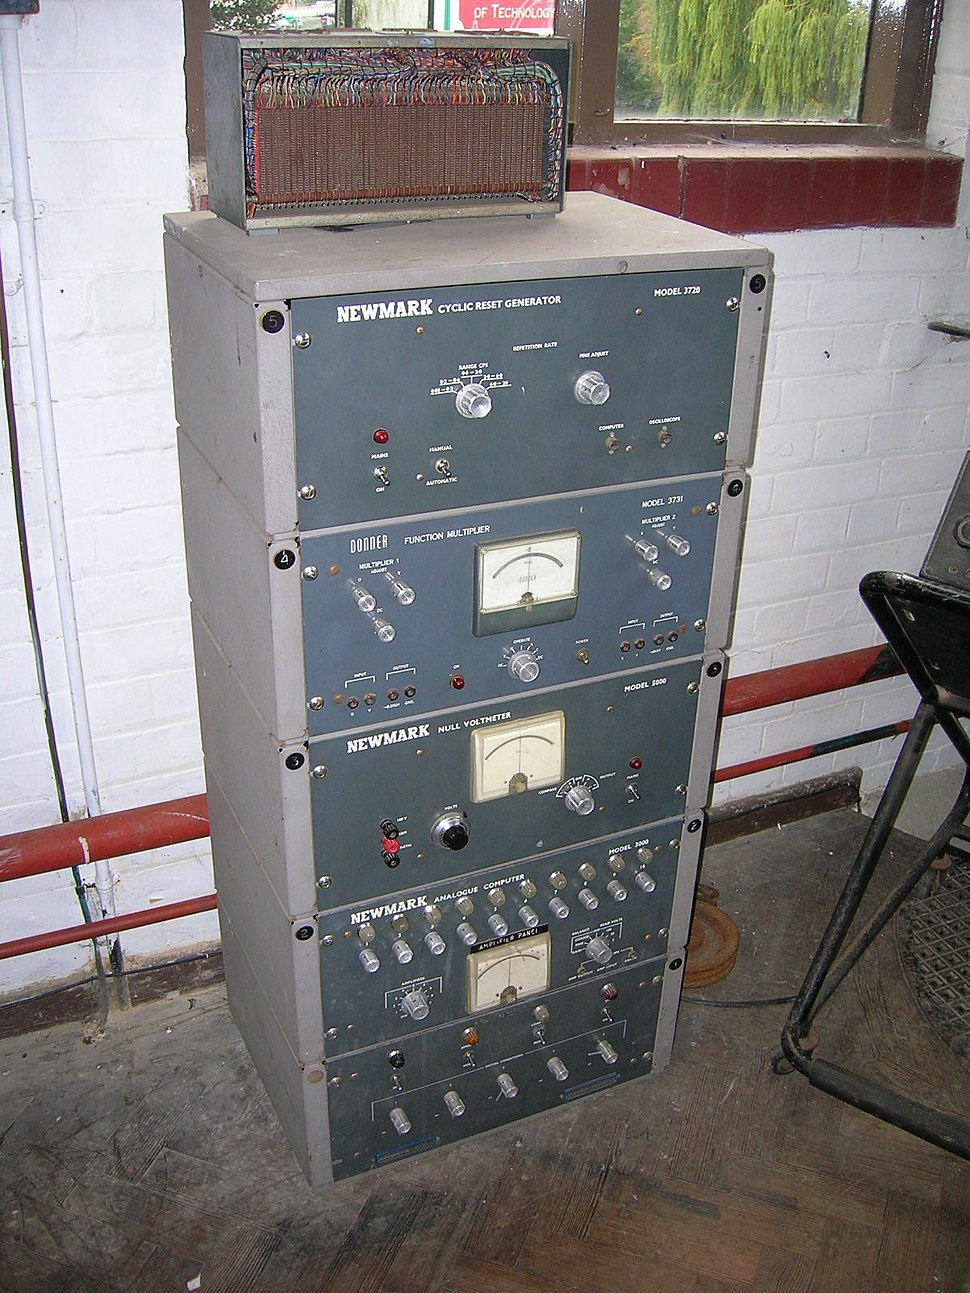 NewmarkAnalogueComputer